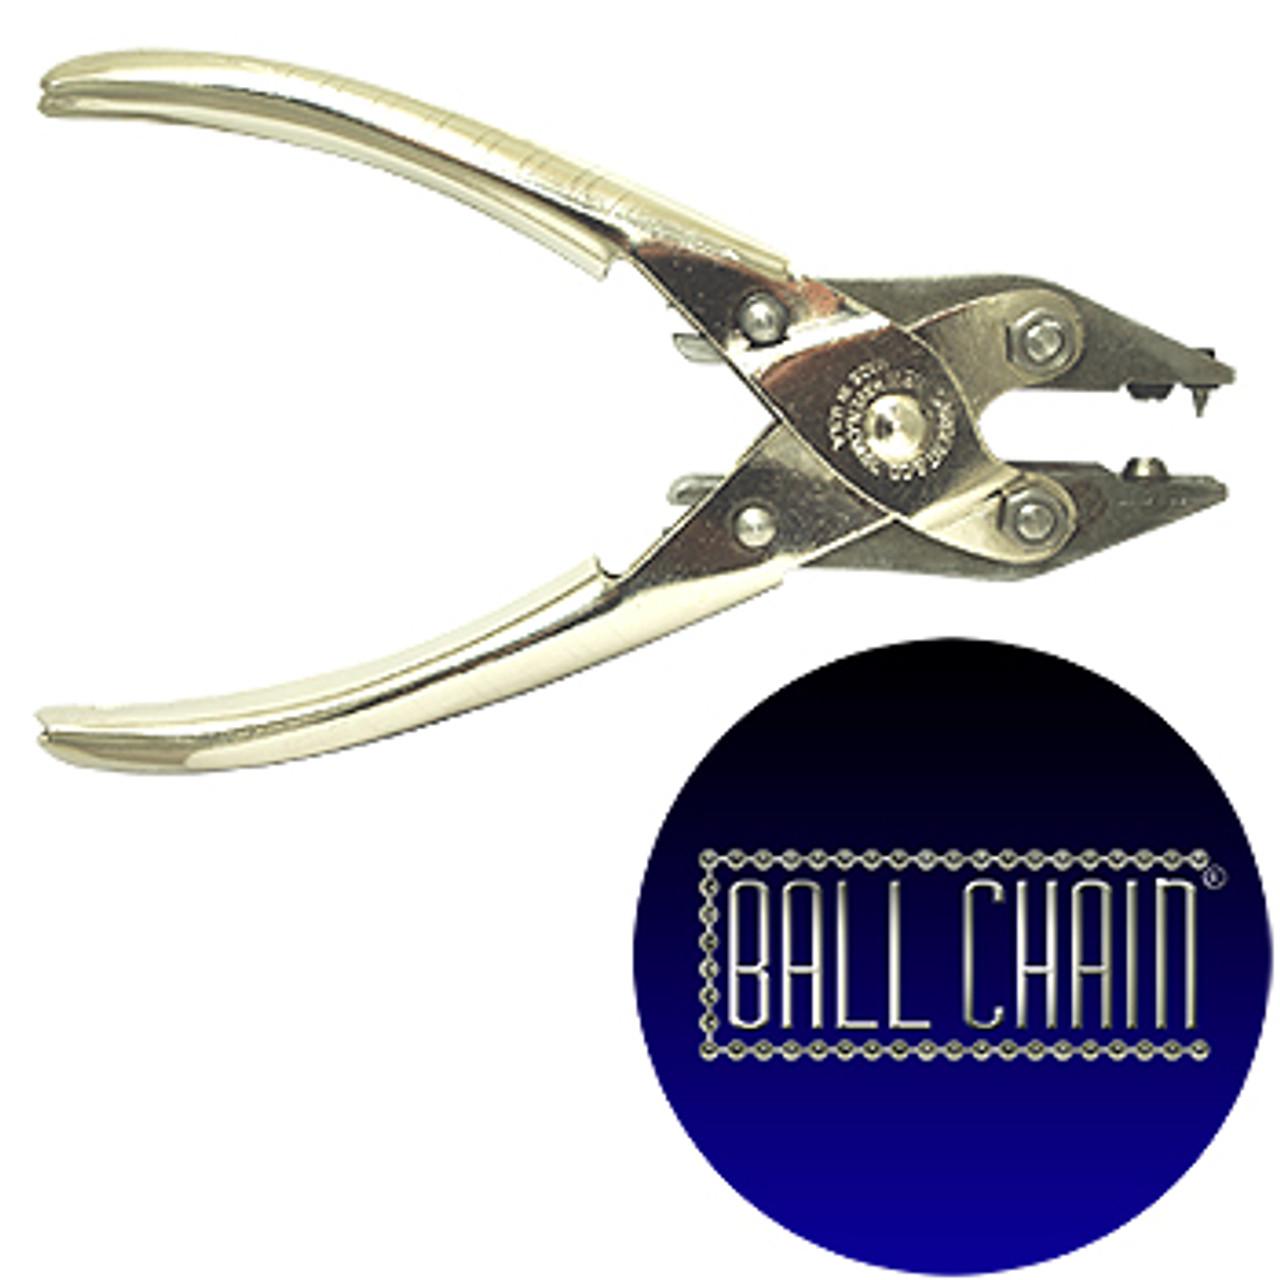 #6 Combination Pliers Aka ball chain splicing tool.